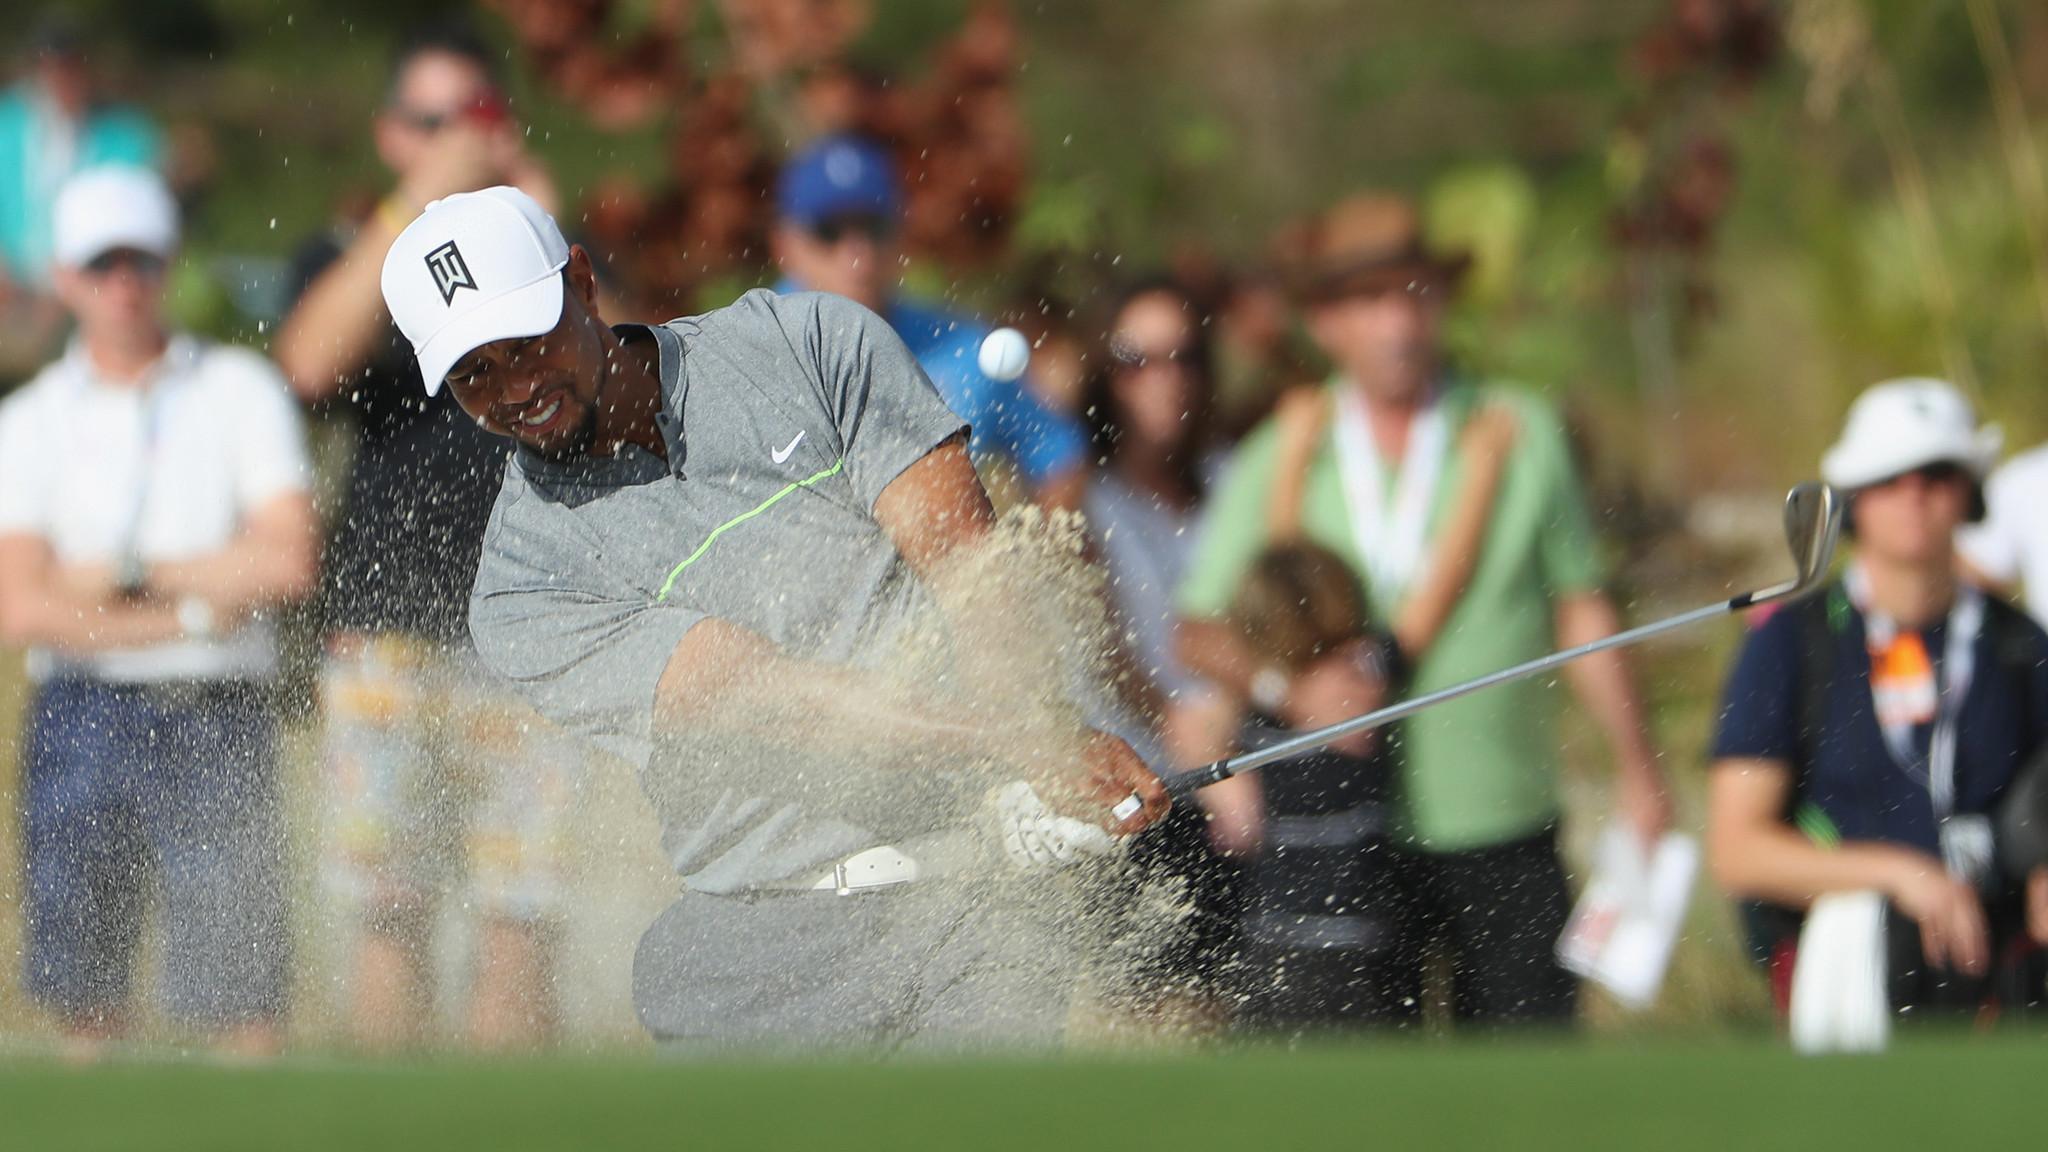 Dc5m United States Mix In English Created At 2016 12 04 0626 Tcash Kartini Steam Wallet Sea While Tiger Woods Falters Hideki Matsuyama Surges To Big Lead Hero World Challenge 524 11